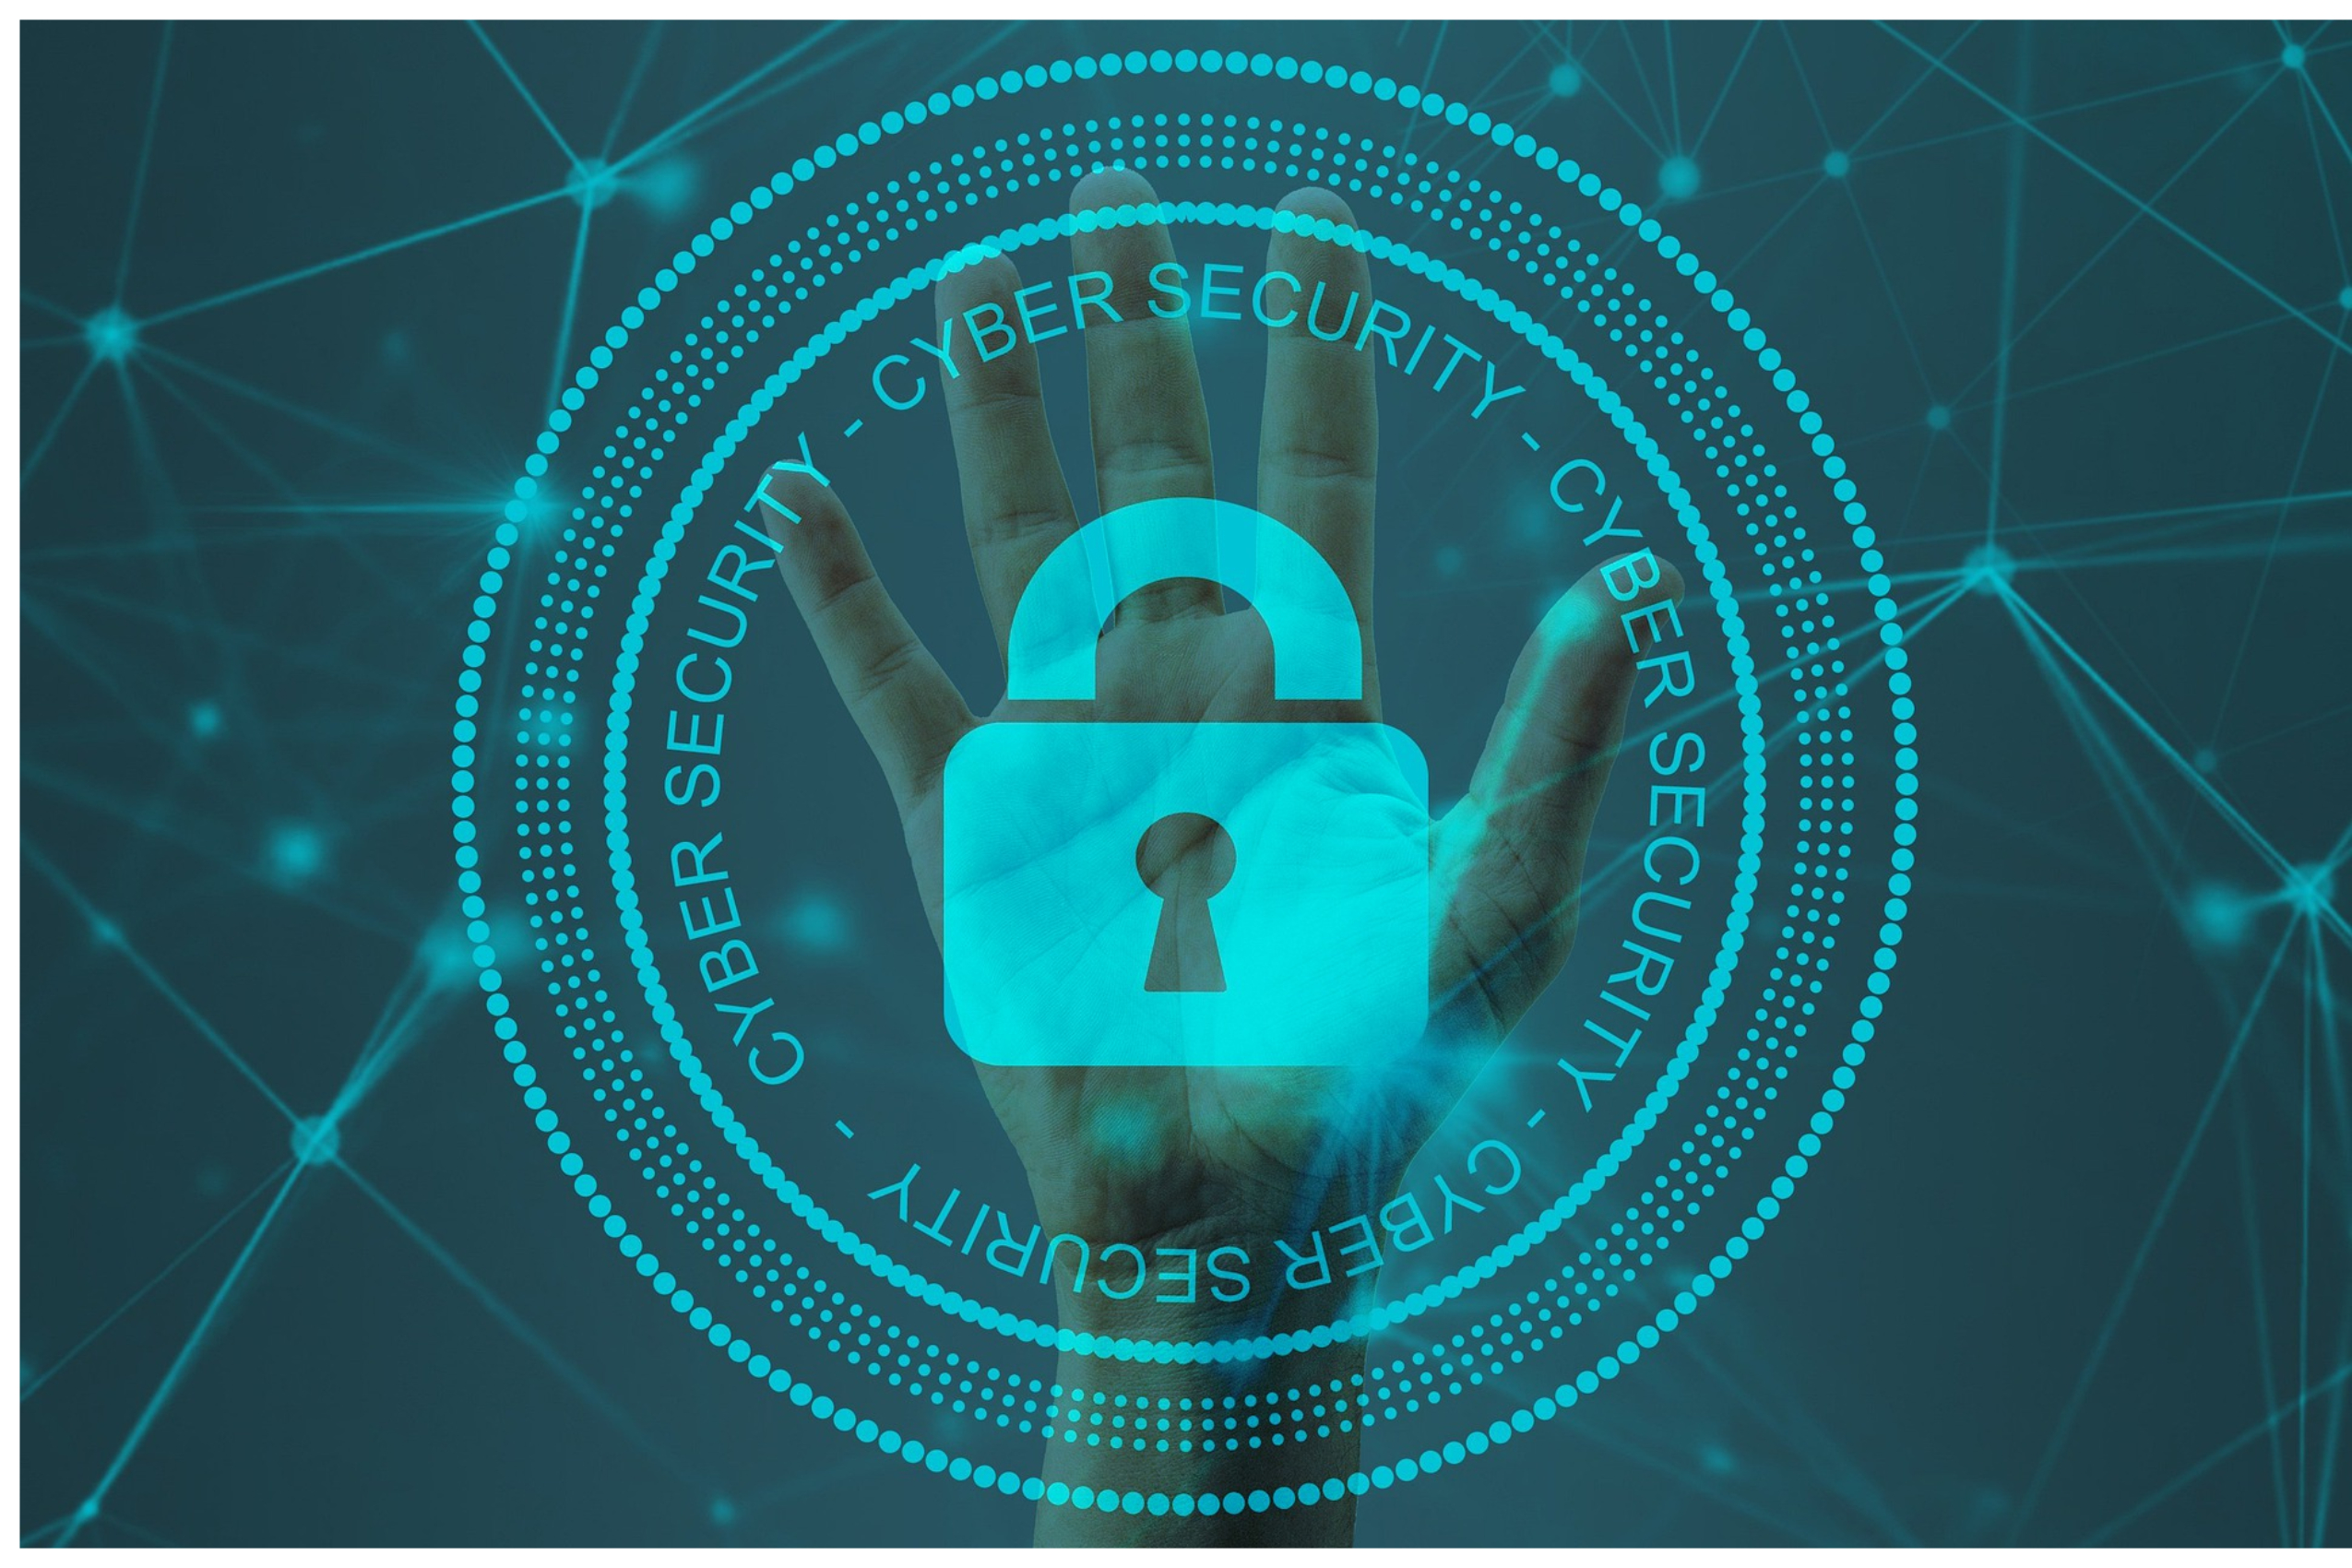 https://www.rhymebiz.com/sites/rhymebiz.com/assets/images/BlogImages/cybersecurity-lock.jpg